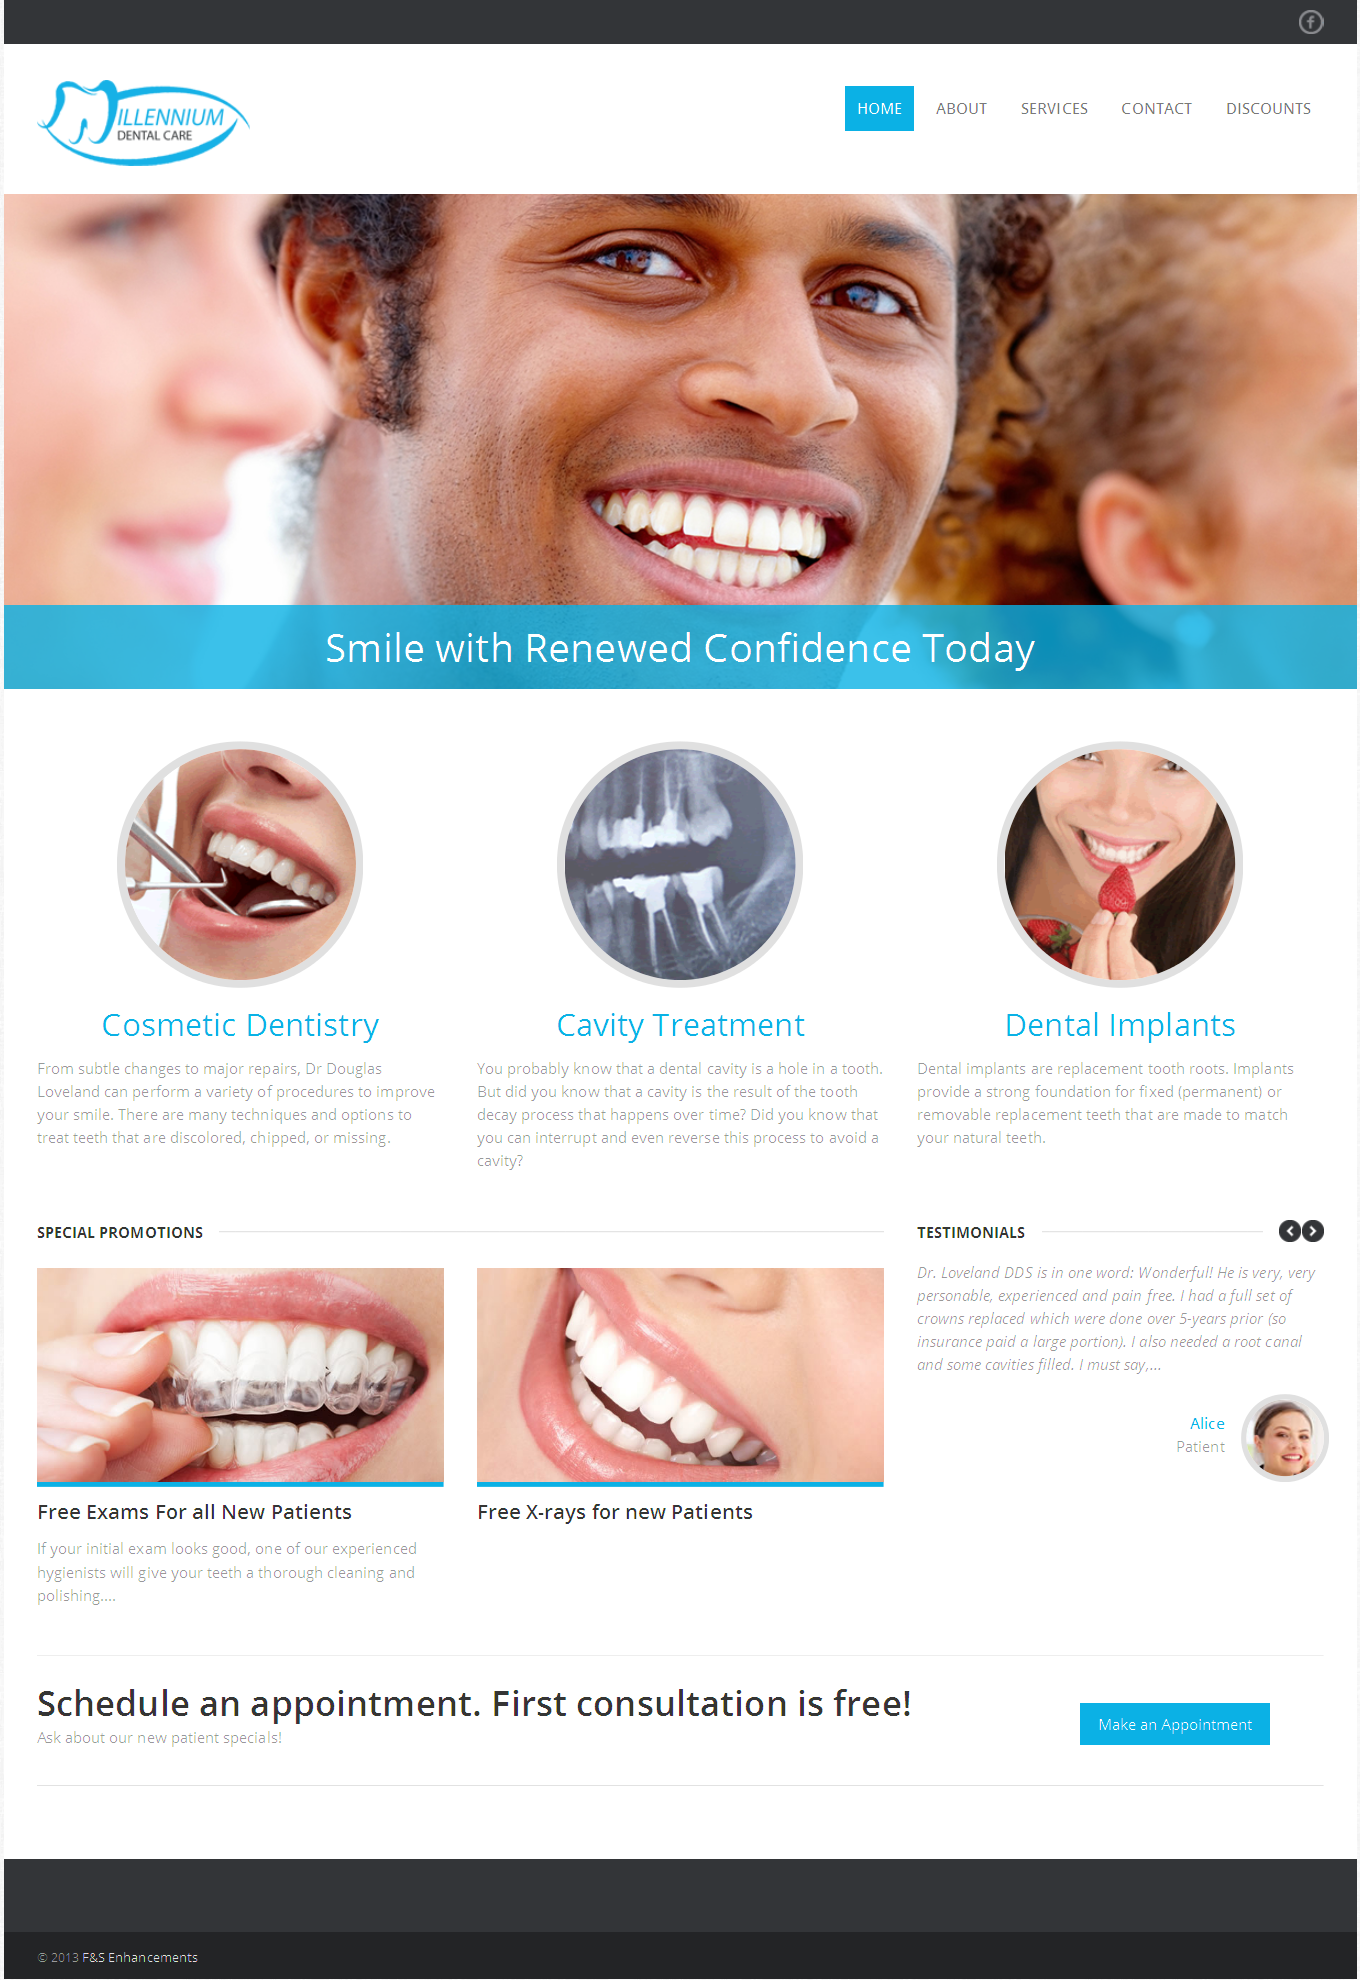 Millennium_Dental_-_2014-09-04_10.03.52